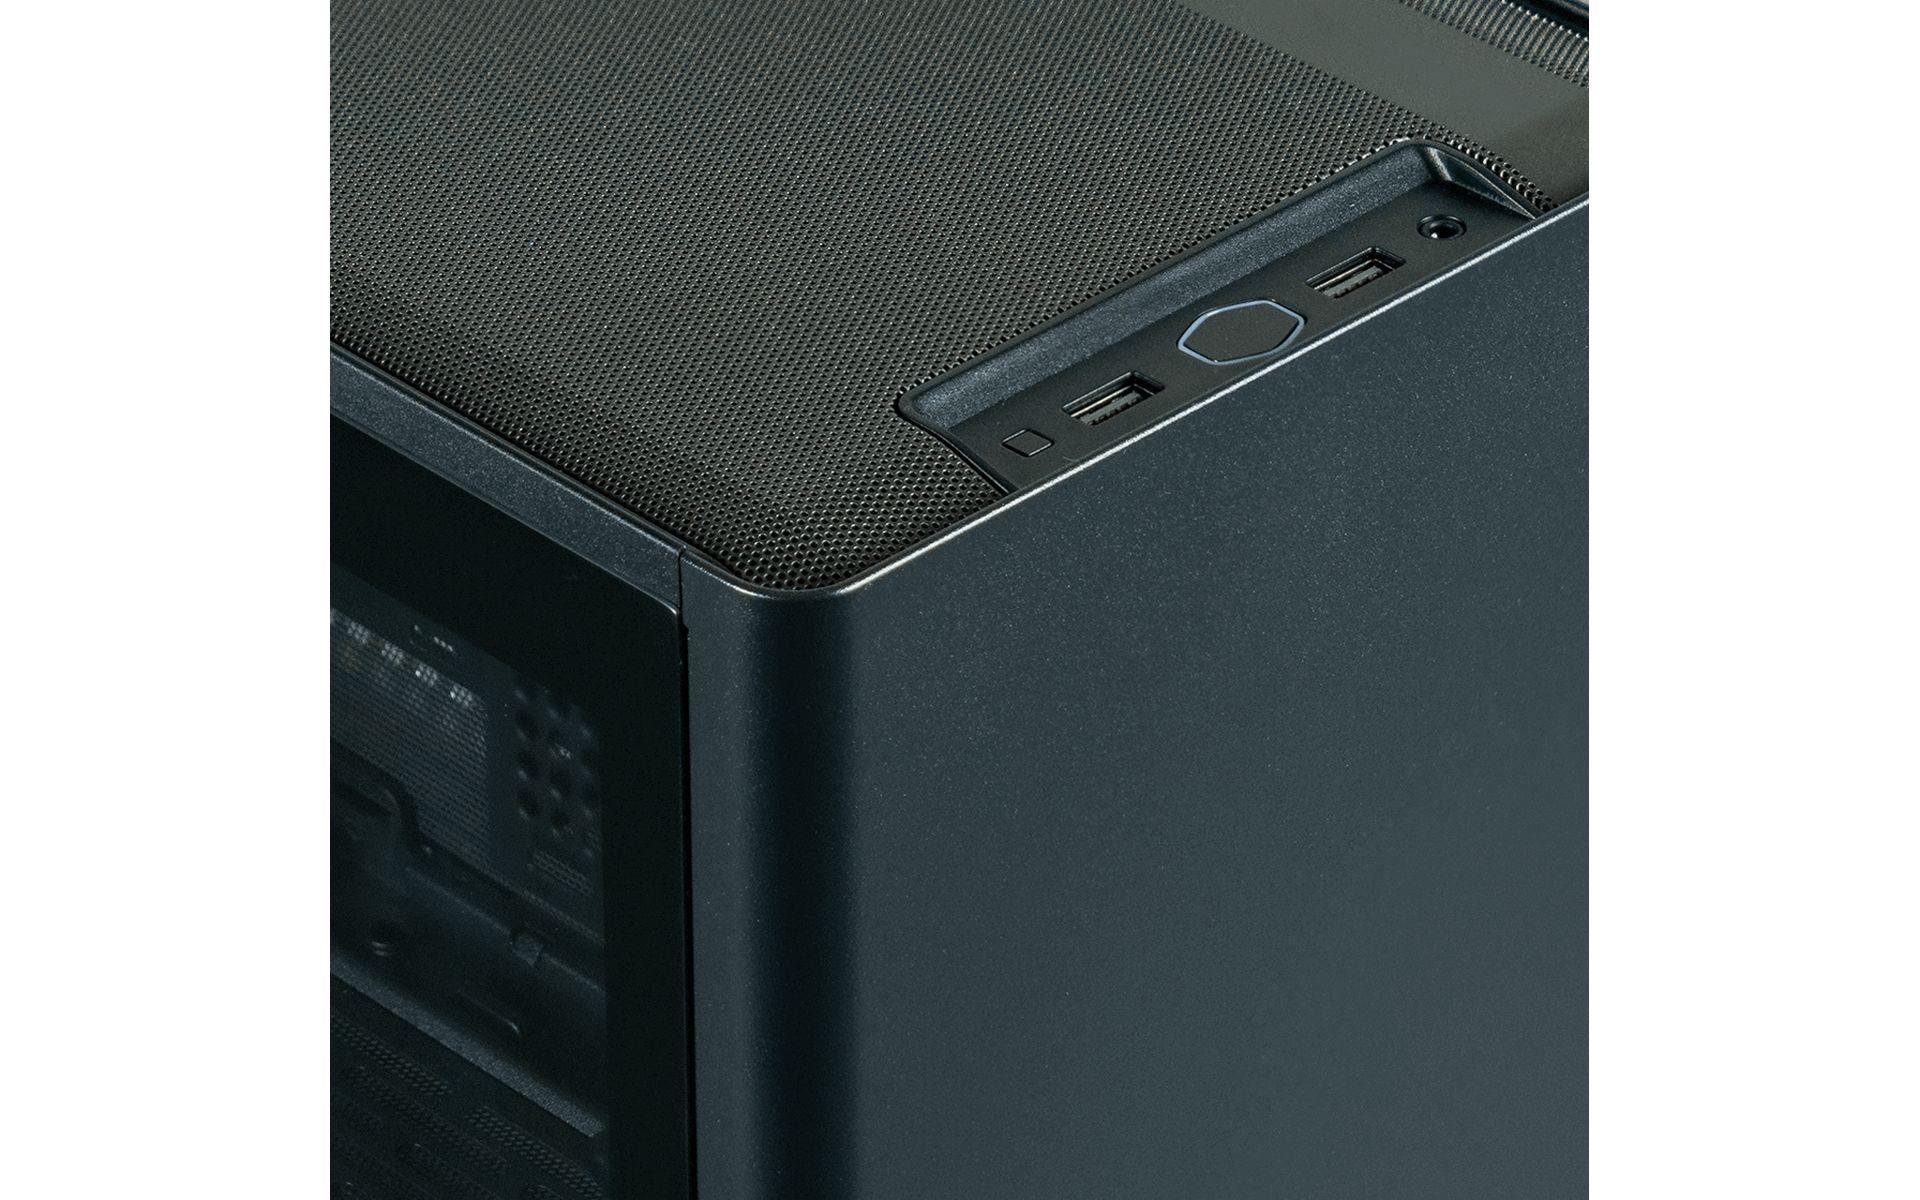 Case Cooler Master MasterBox NR200P Black sử dụng thép mạ SGCC